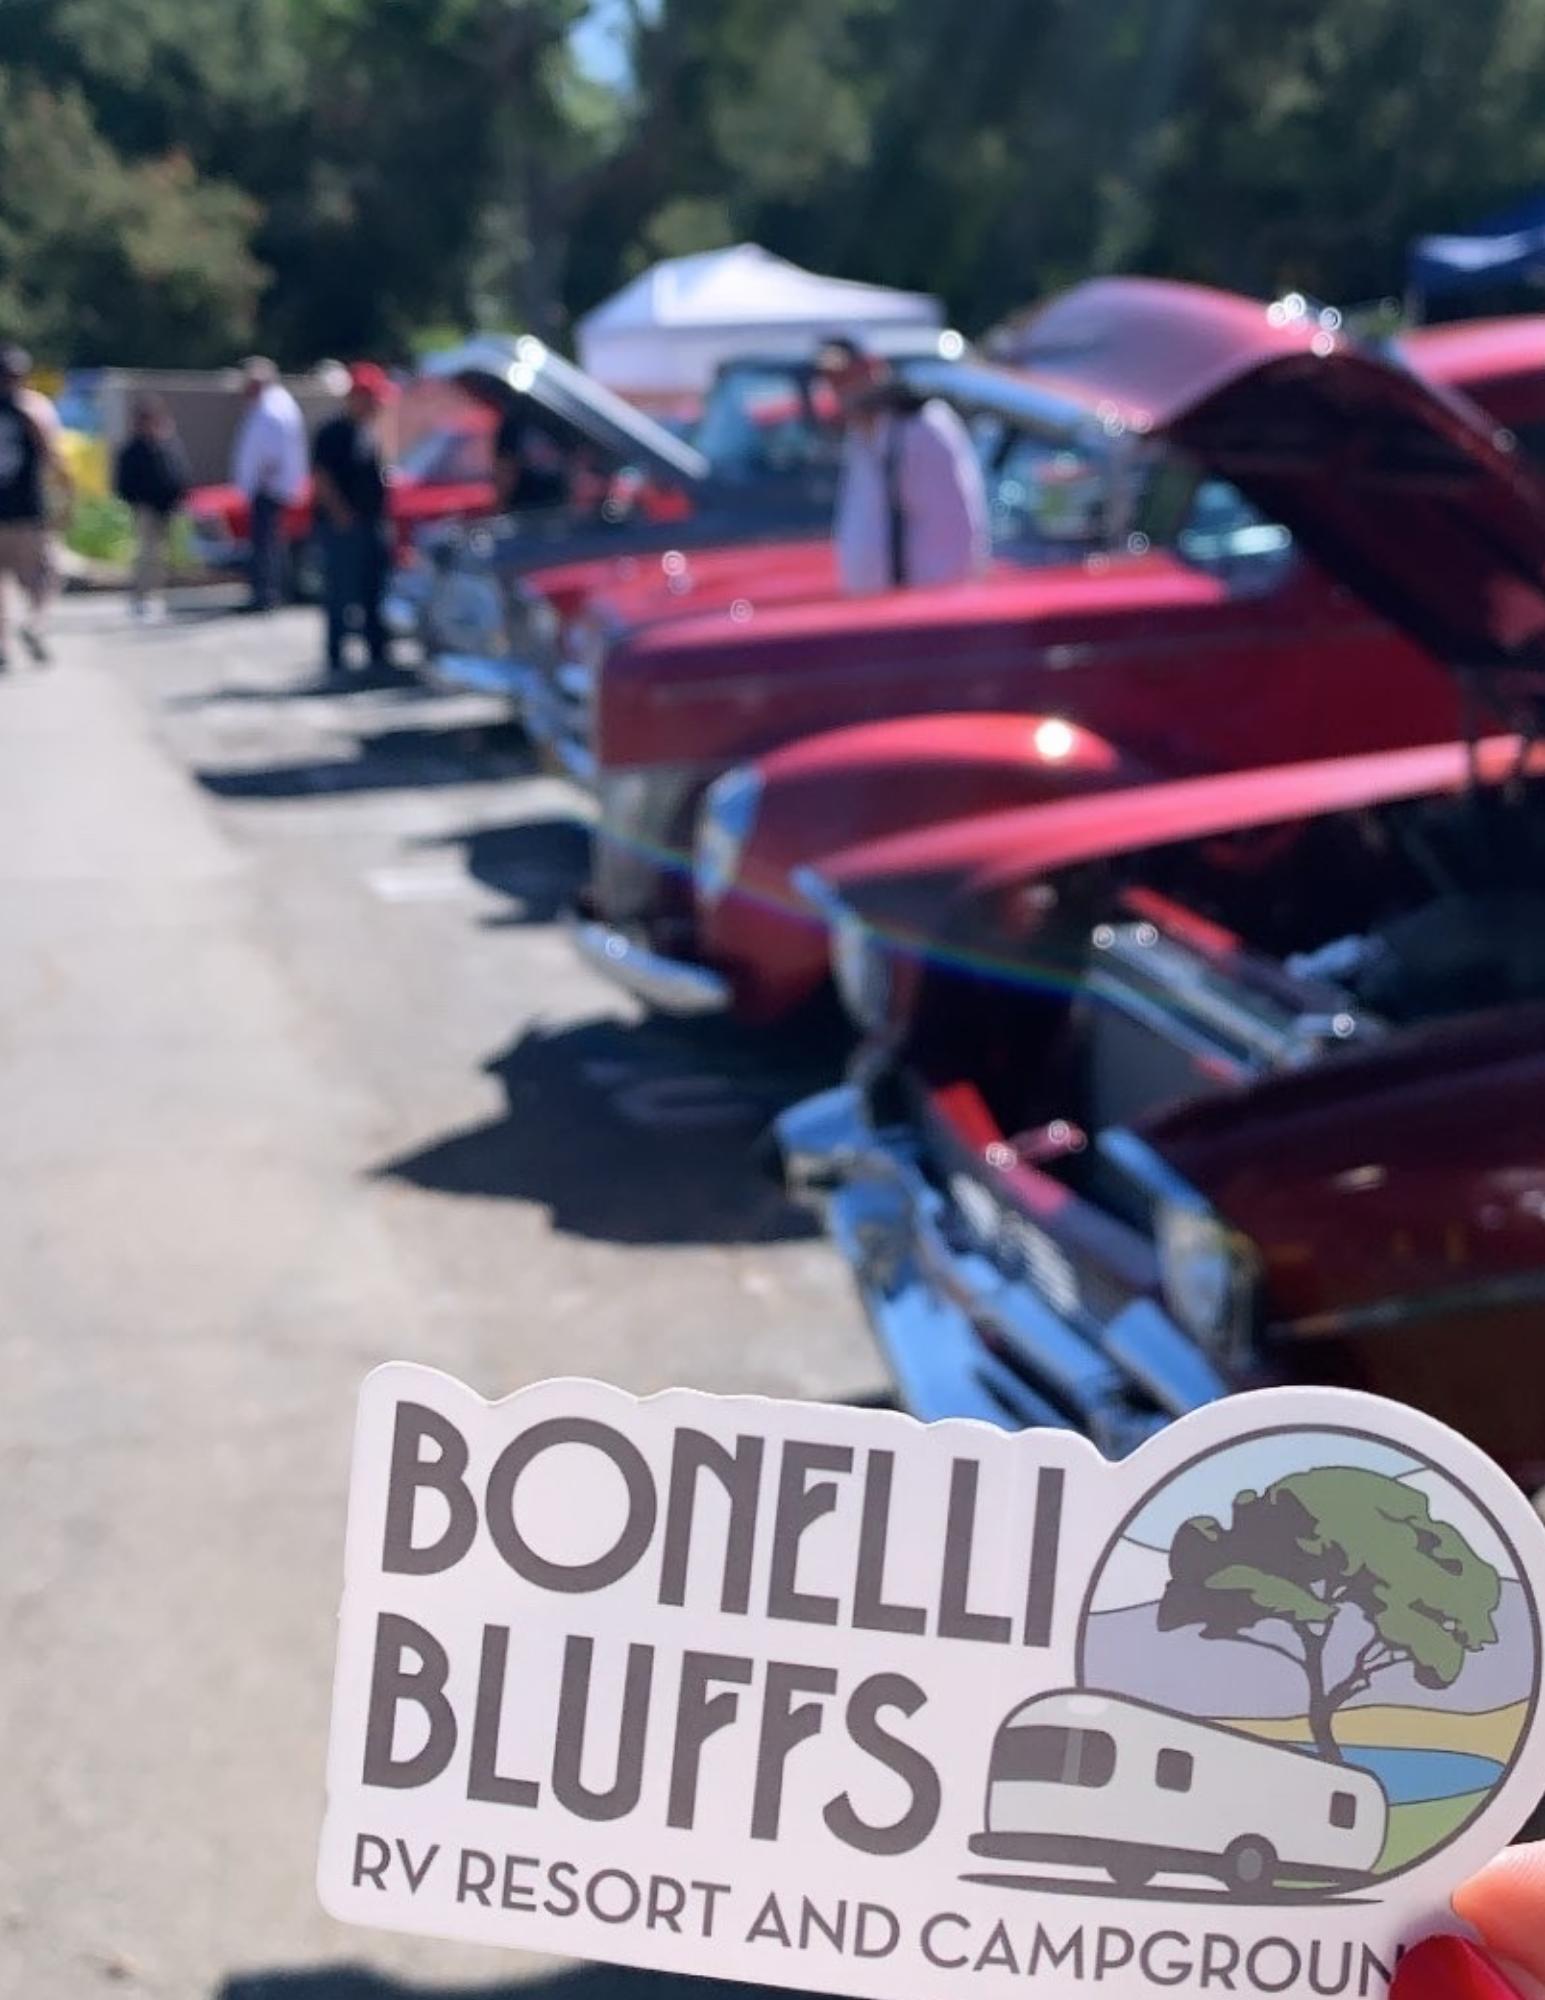 Bonelli Bluffs Makes Generous Donation